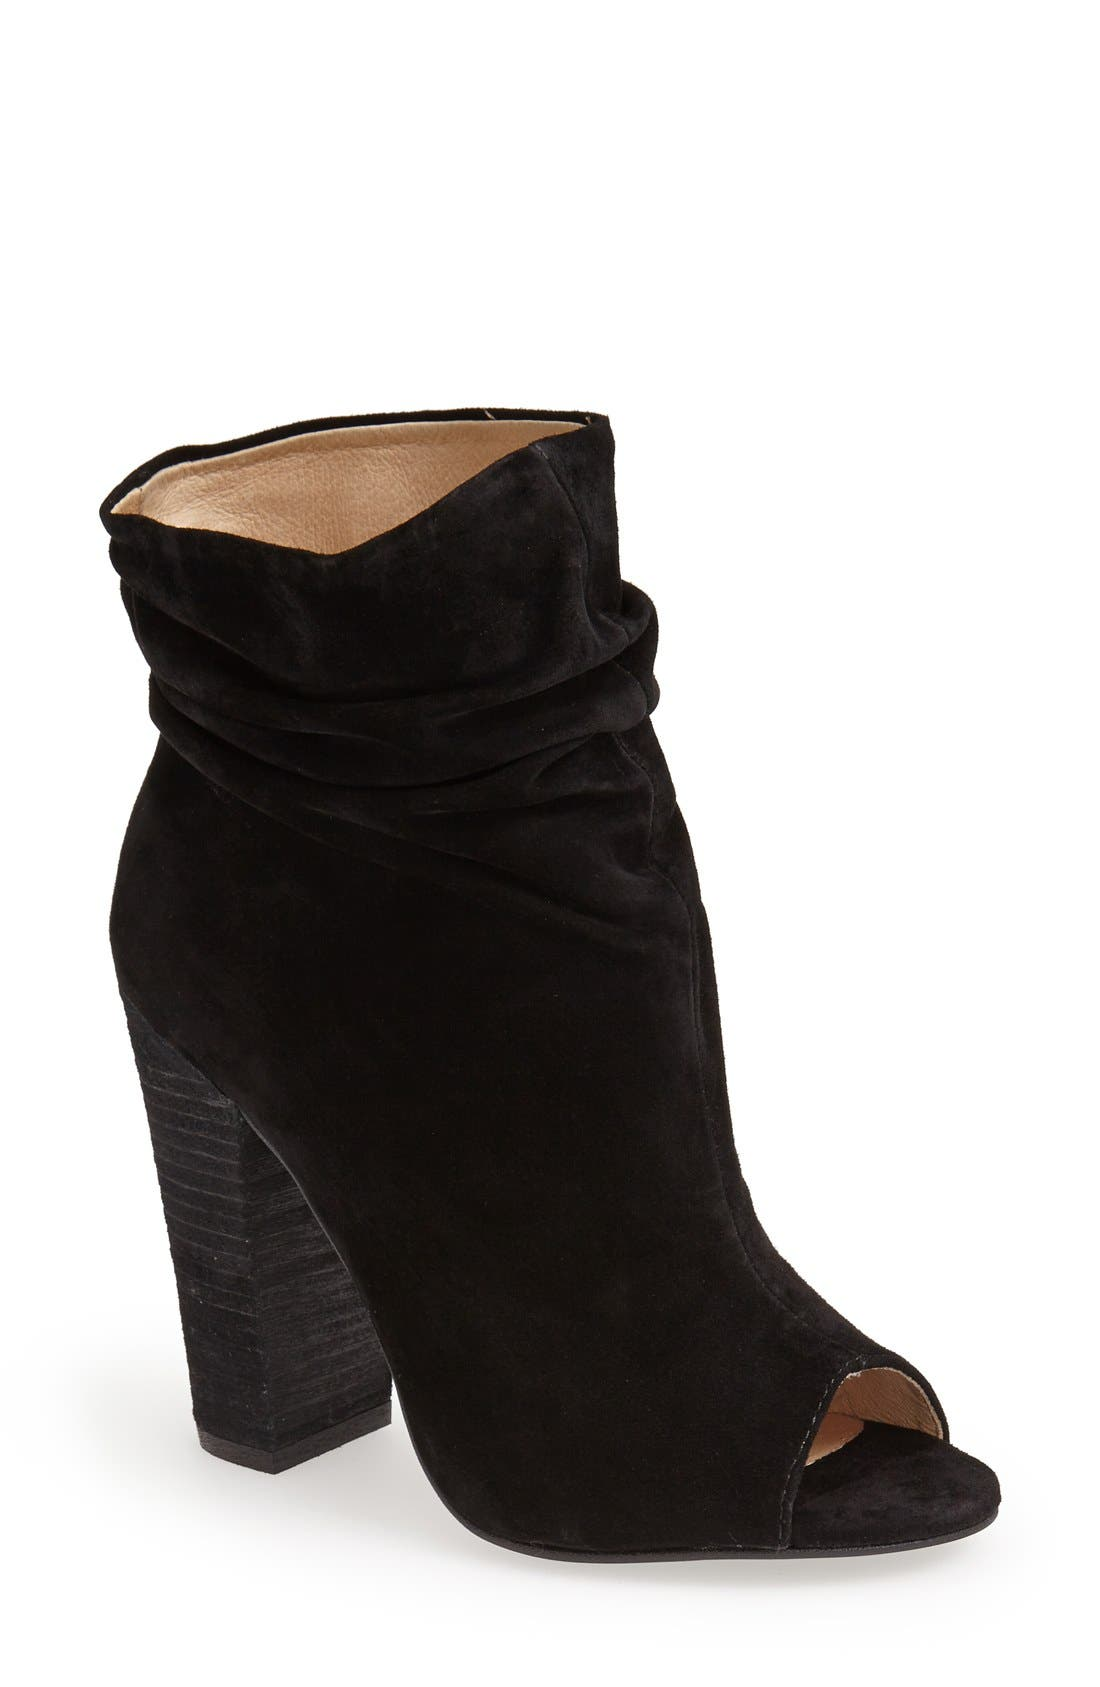 'Laurel' Peep Toe Bootie, Main, color, 001